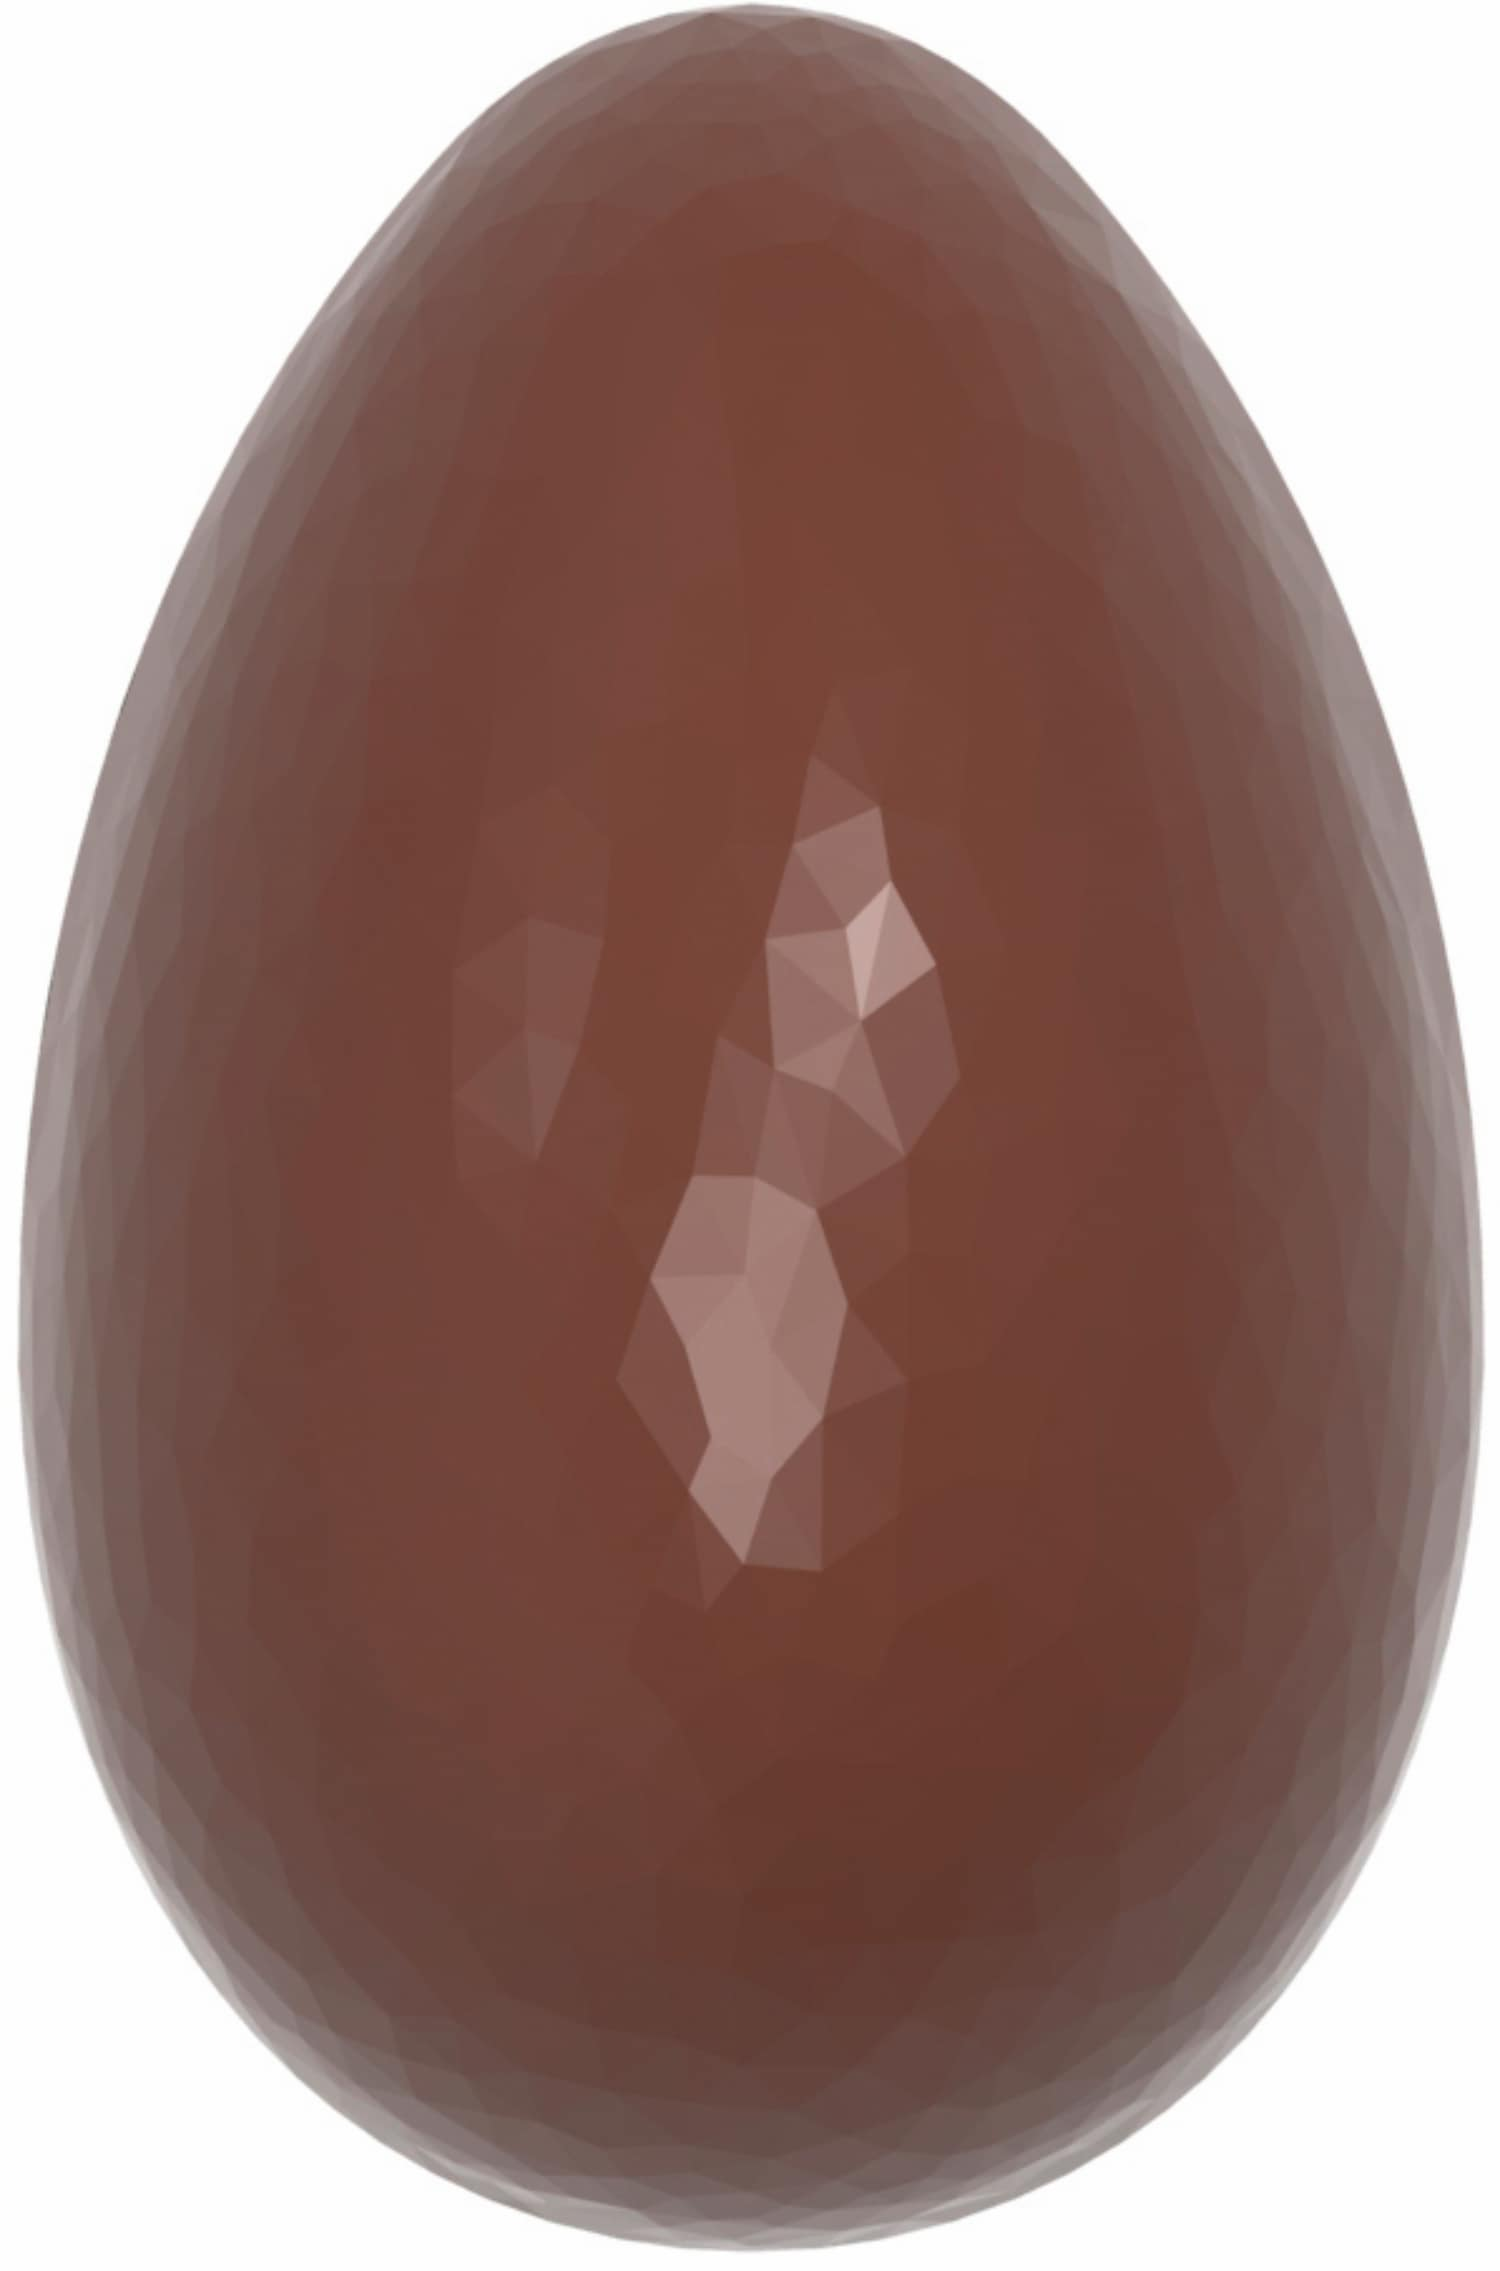 "Schokoladenform ""Osterei"" 421910"